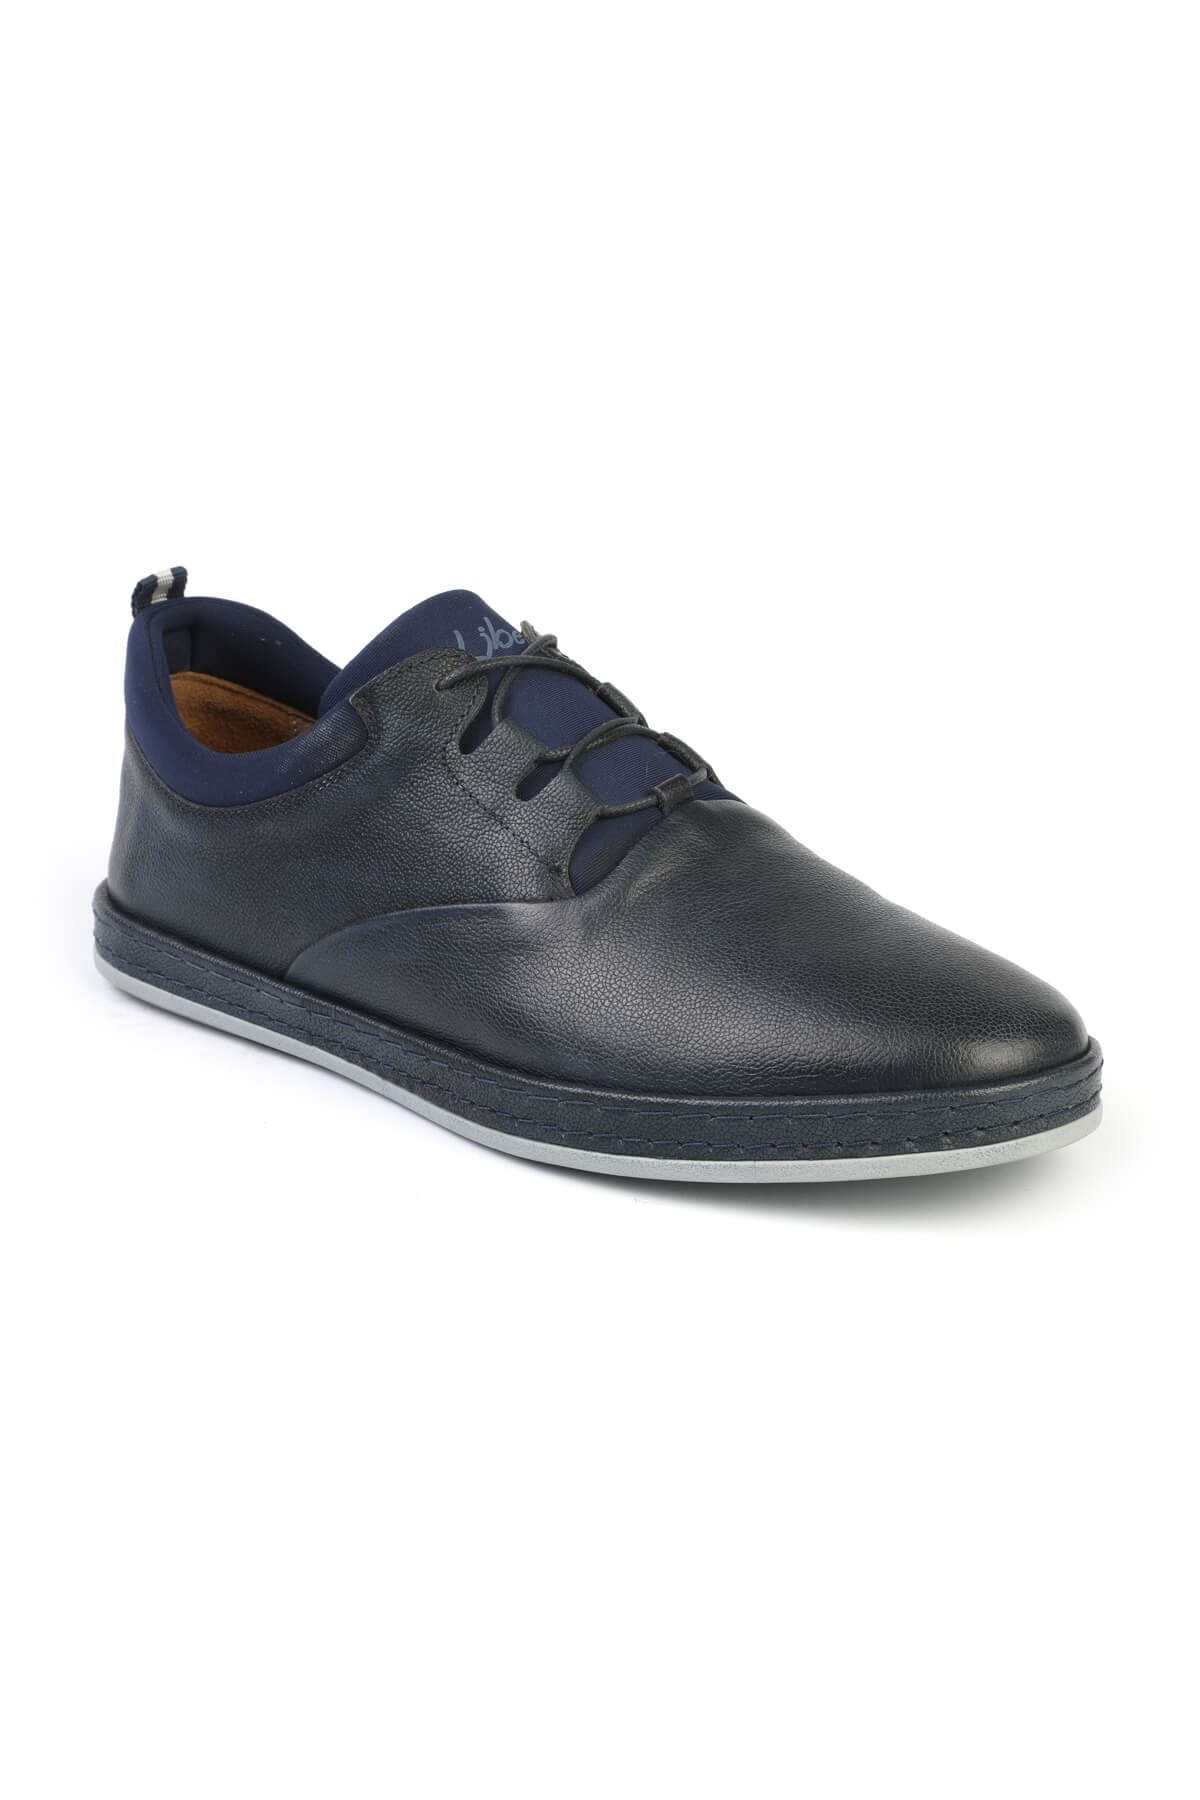 Libero 2979 Navy Blue Casual Shoes